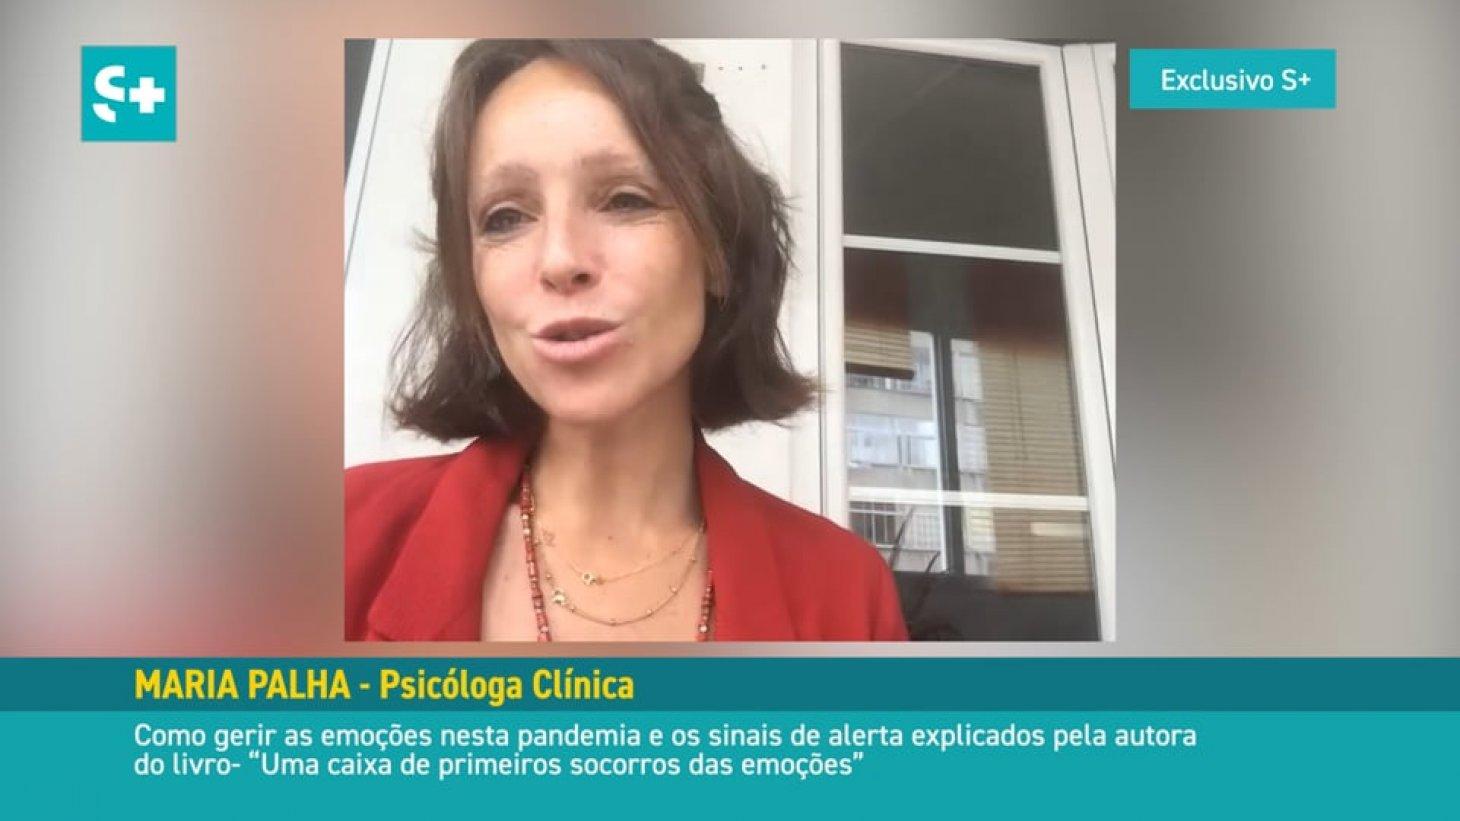 Maria Palha